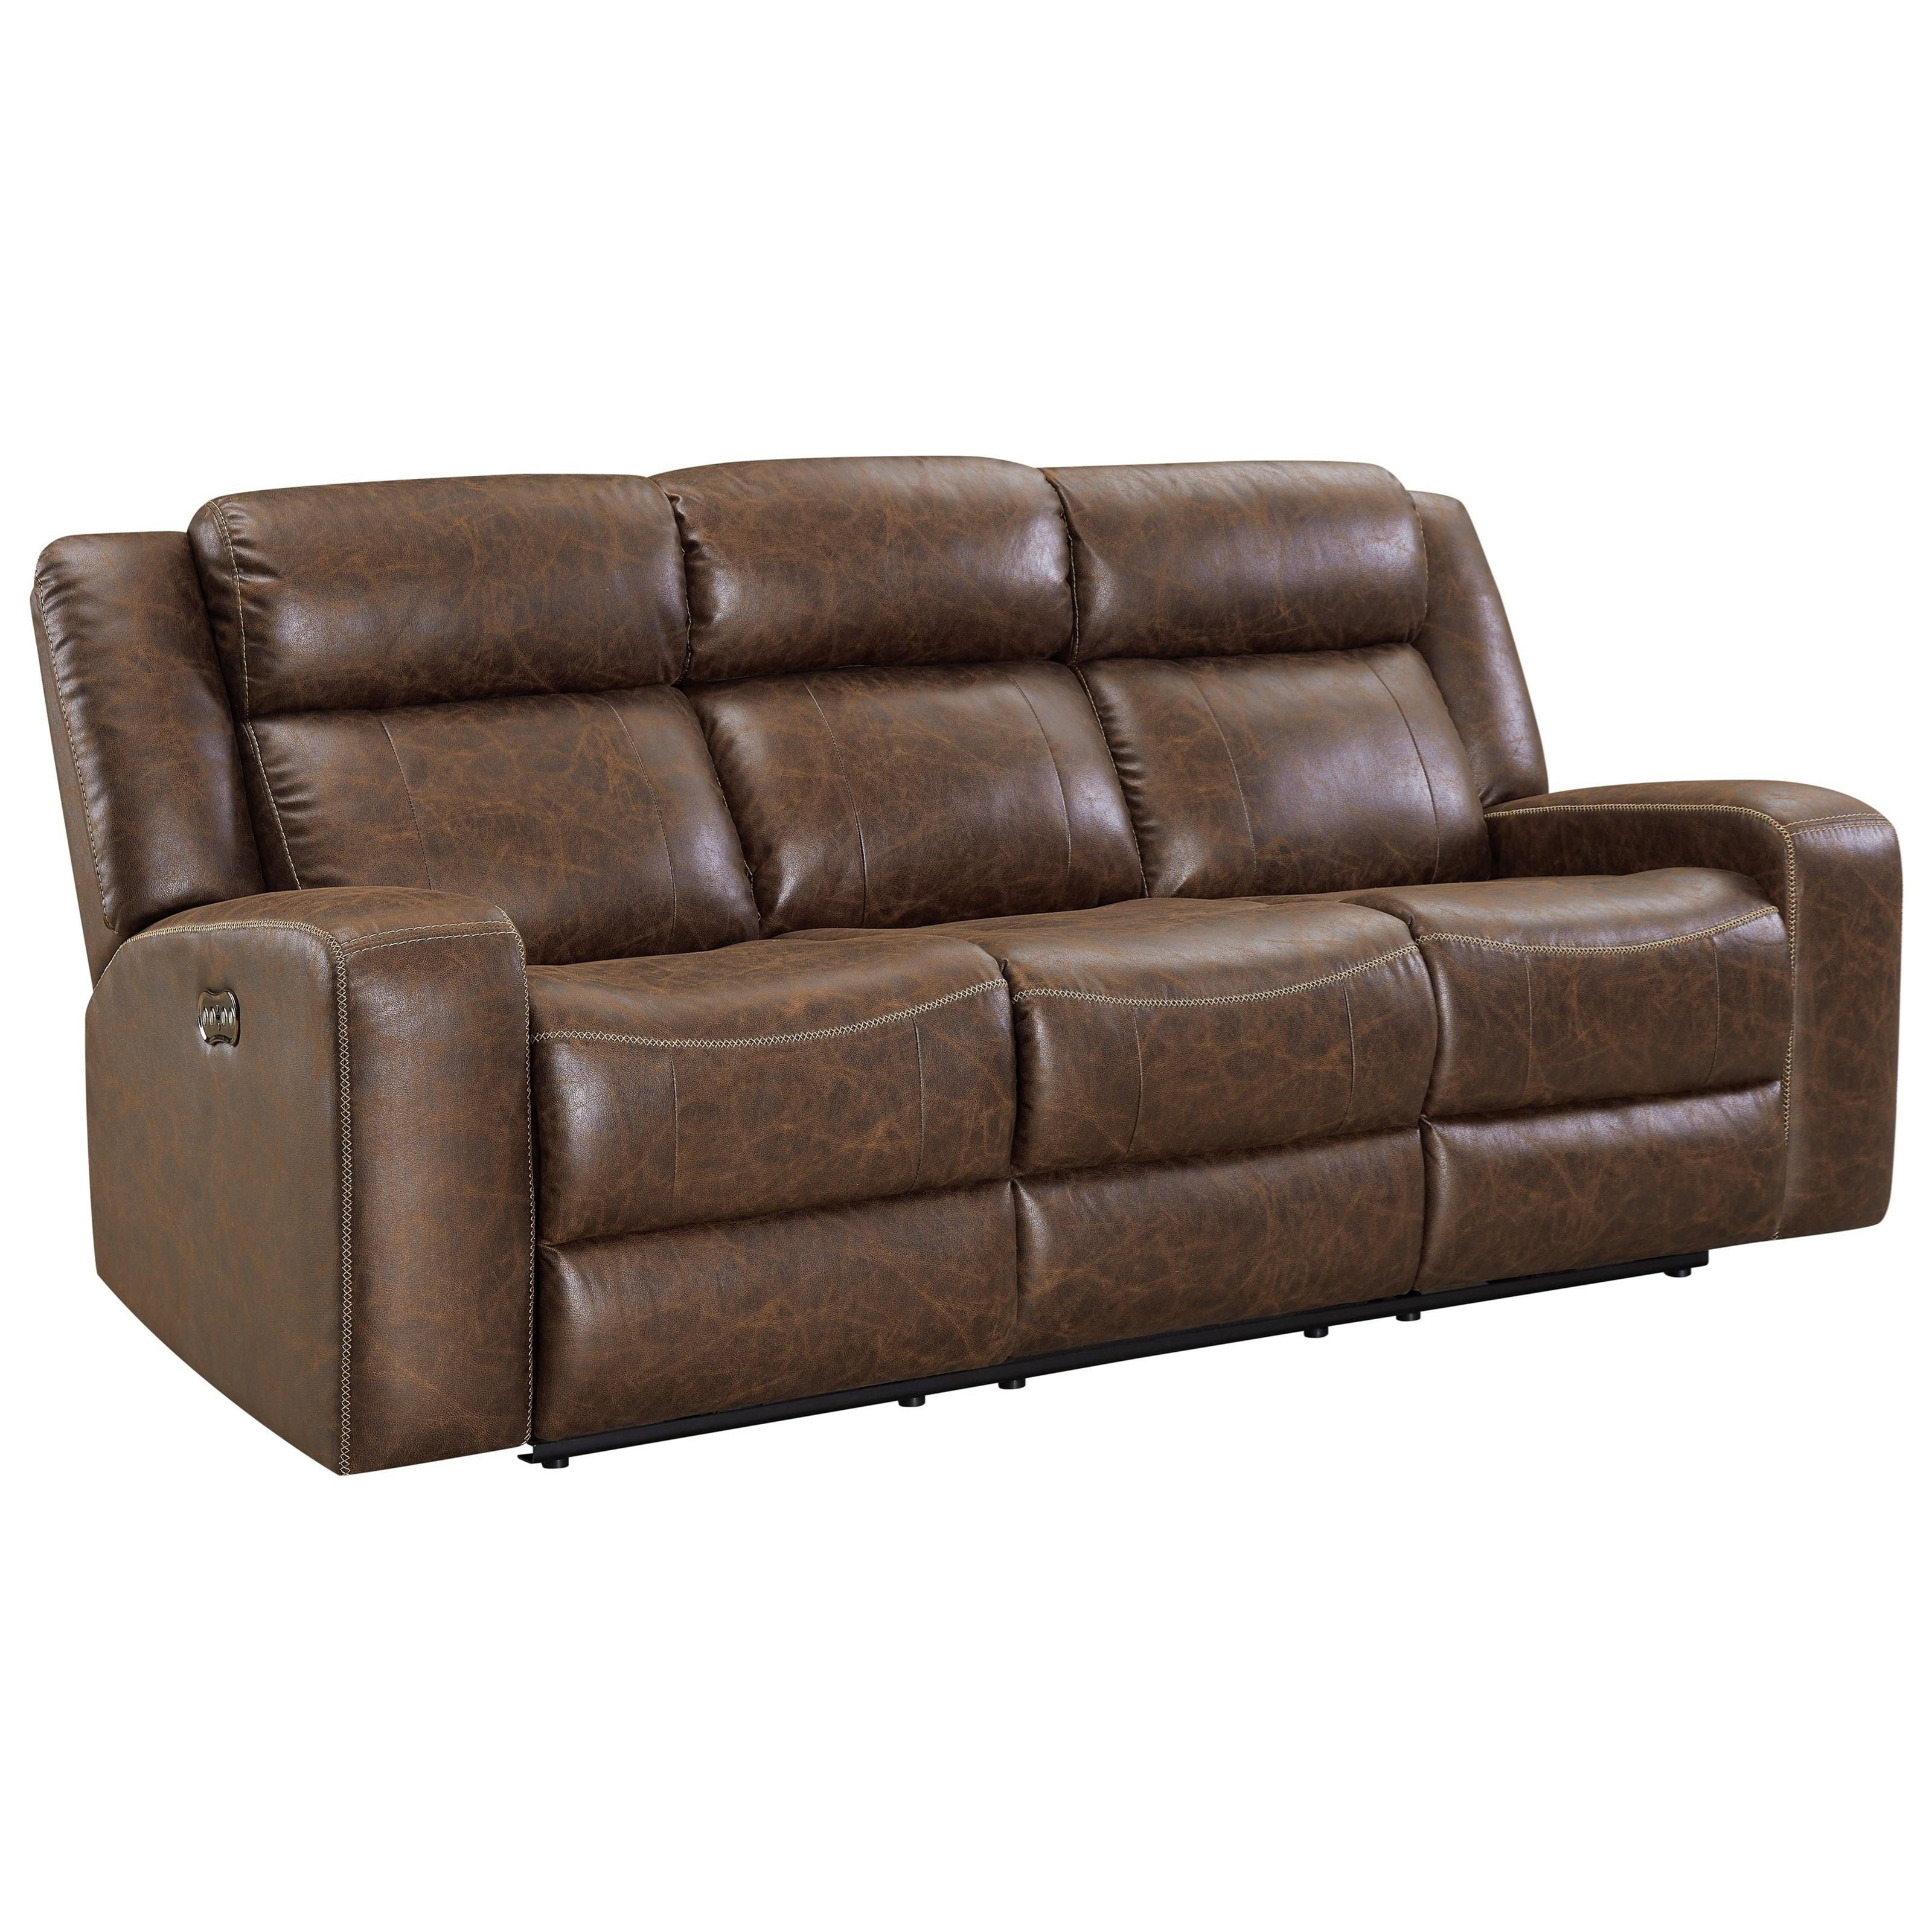 Atticus Power Dual Recliner Sofa by New Classic at Carolina Direct